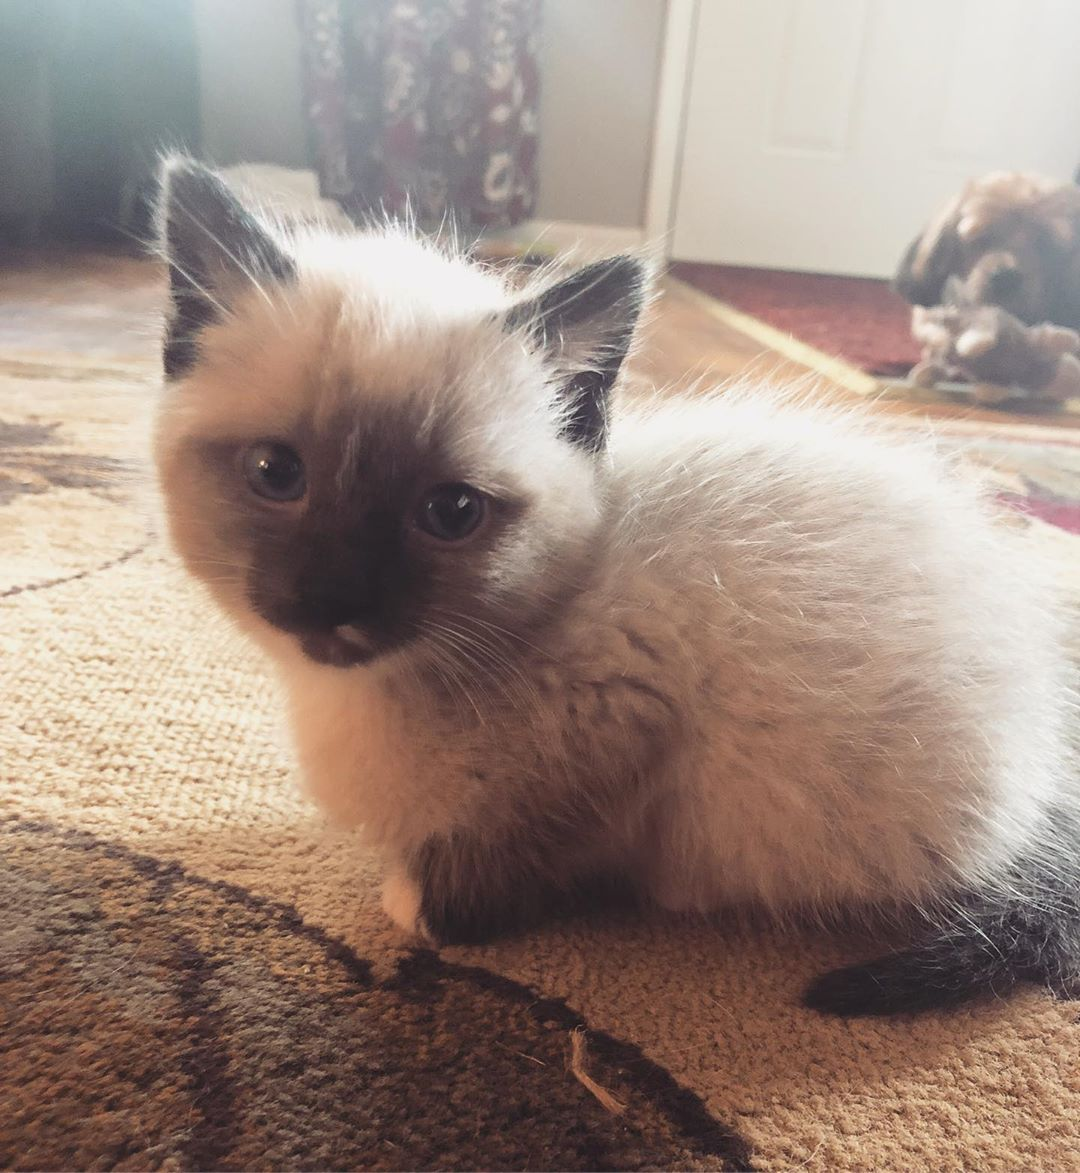 My Name Is Ming Im 8 Weeks Old Im Smol And I Like To Play And Sleep Siamesecat Siamese Siamesekitten Siamese Love Si Cat Day Feline Siamese Kittens